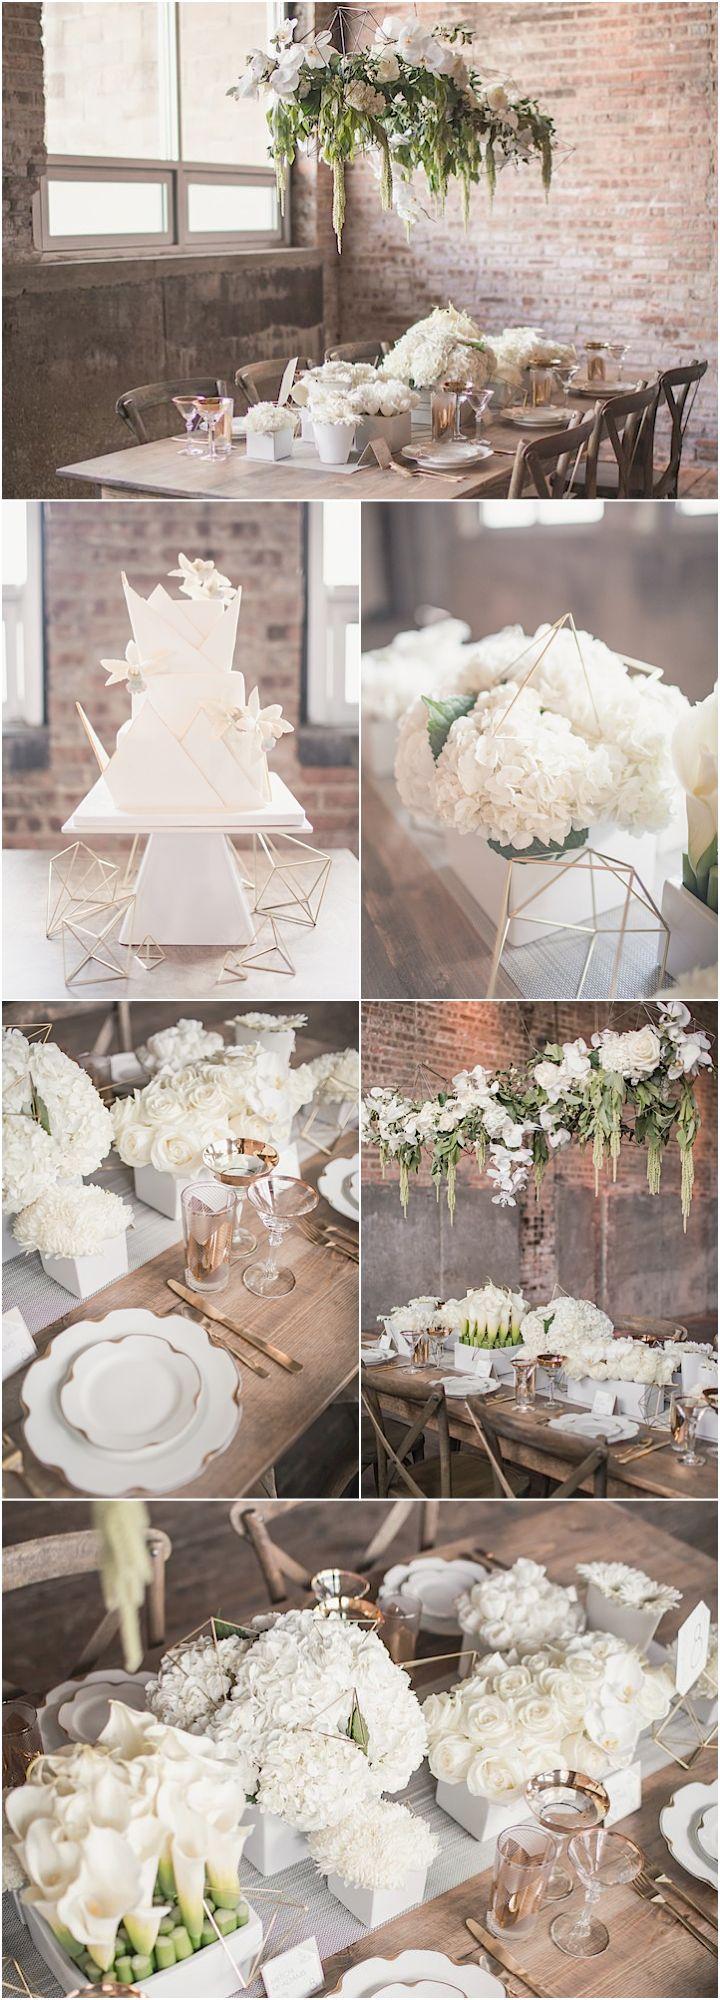 Featured Photographer: MGB Photo; elegant white wedding reception details